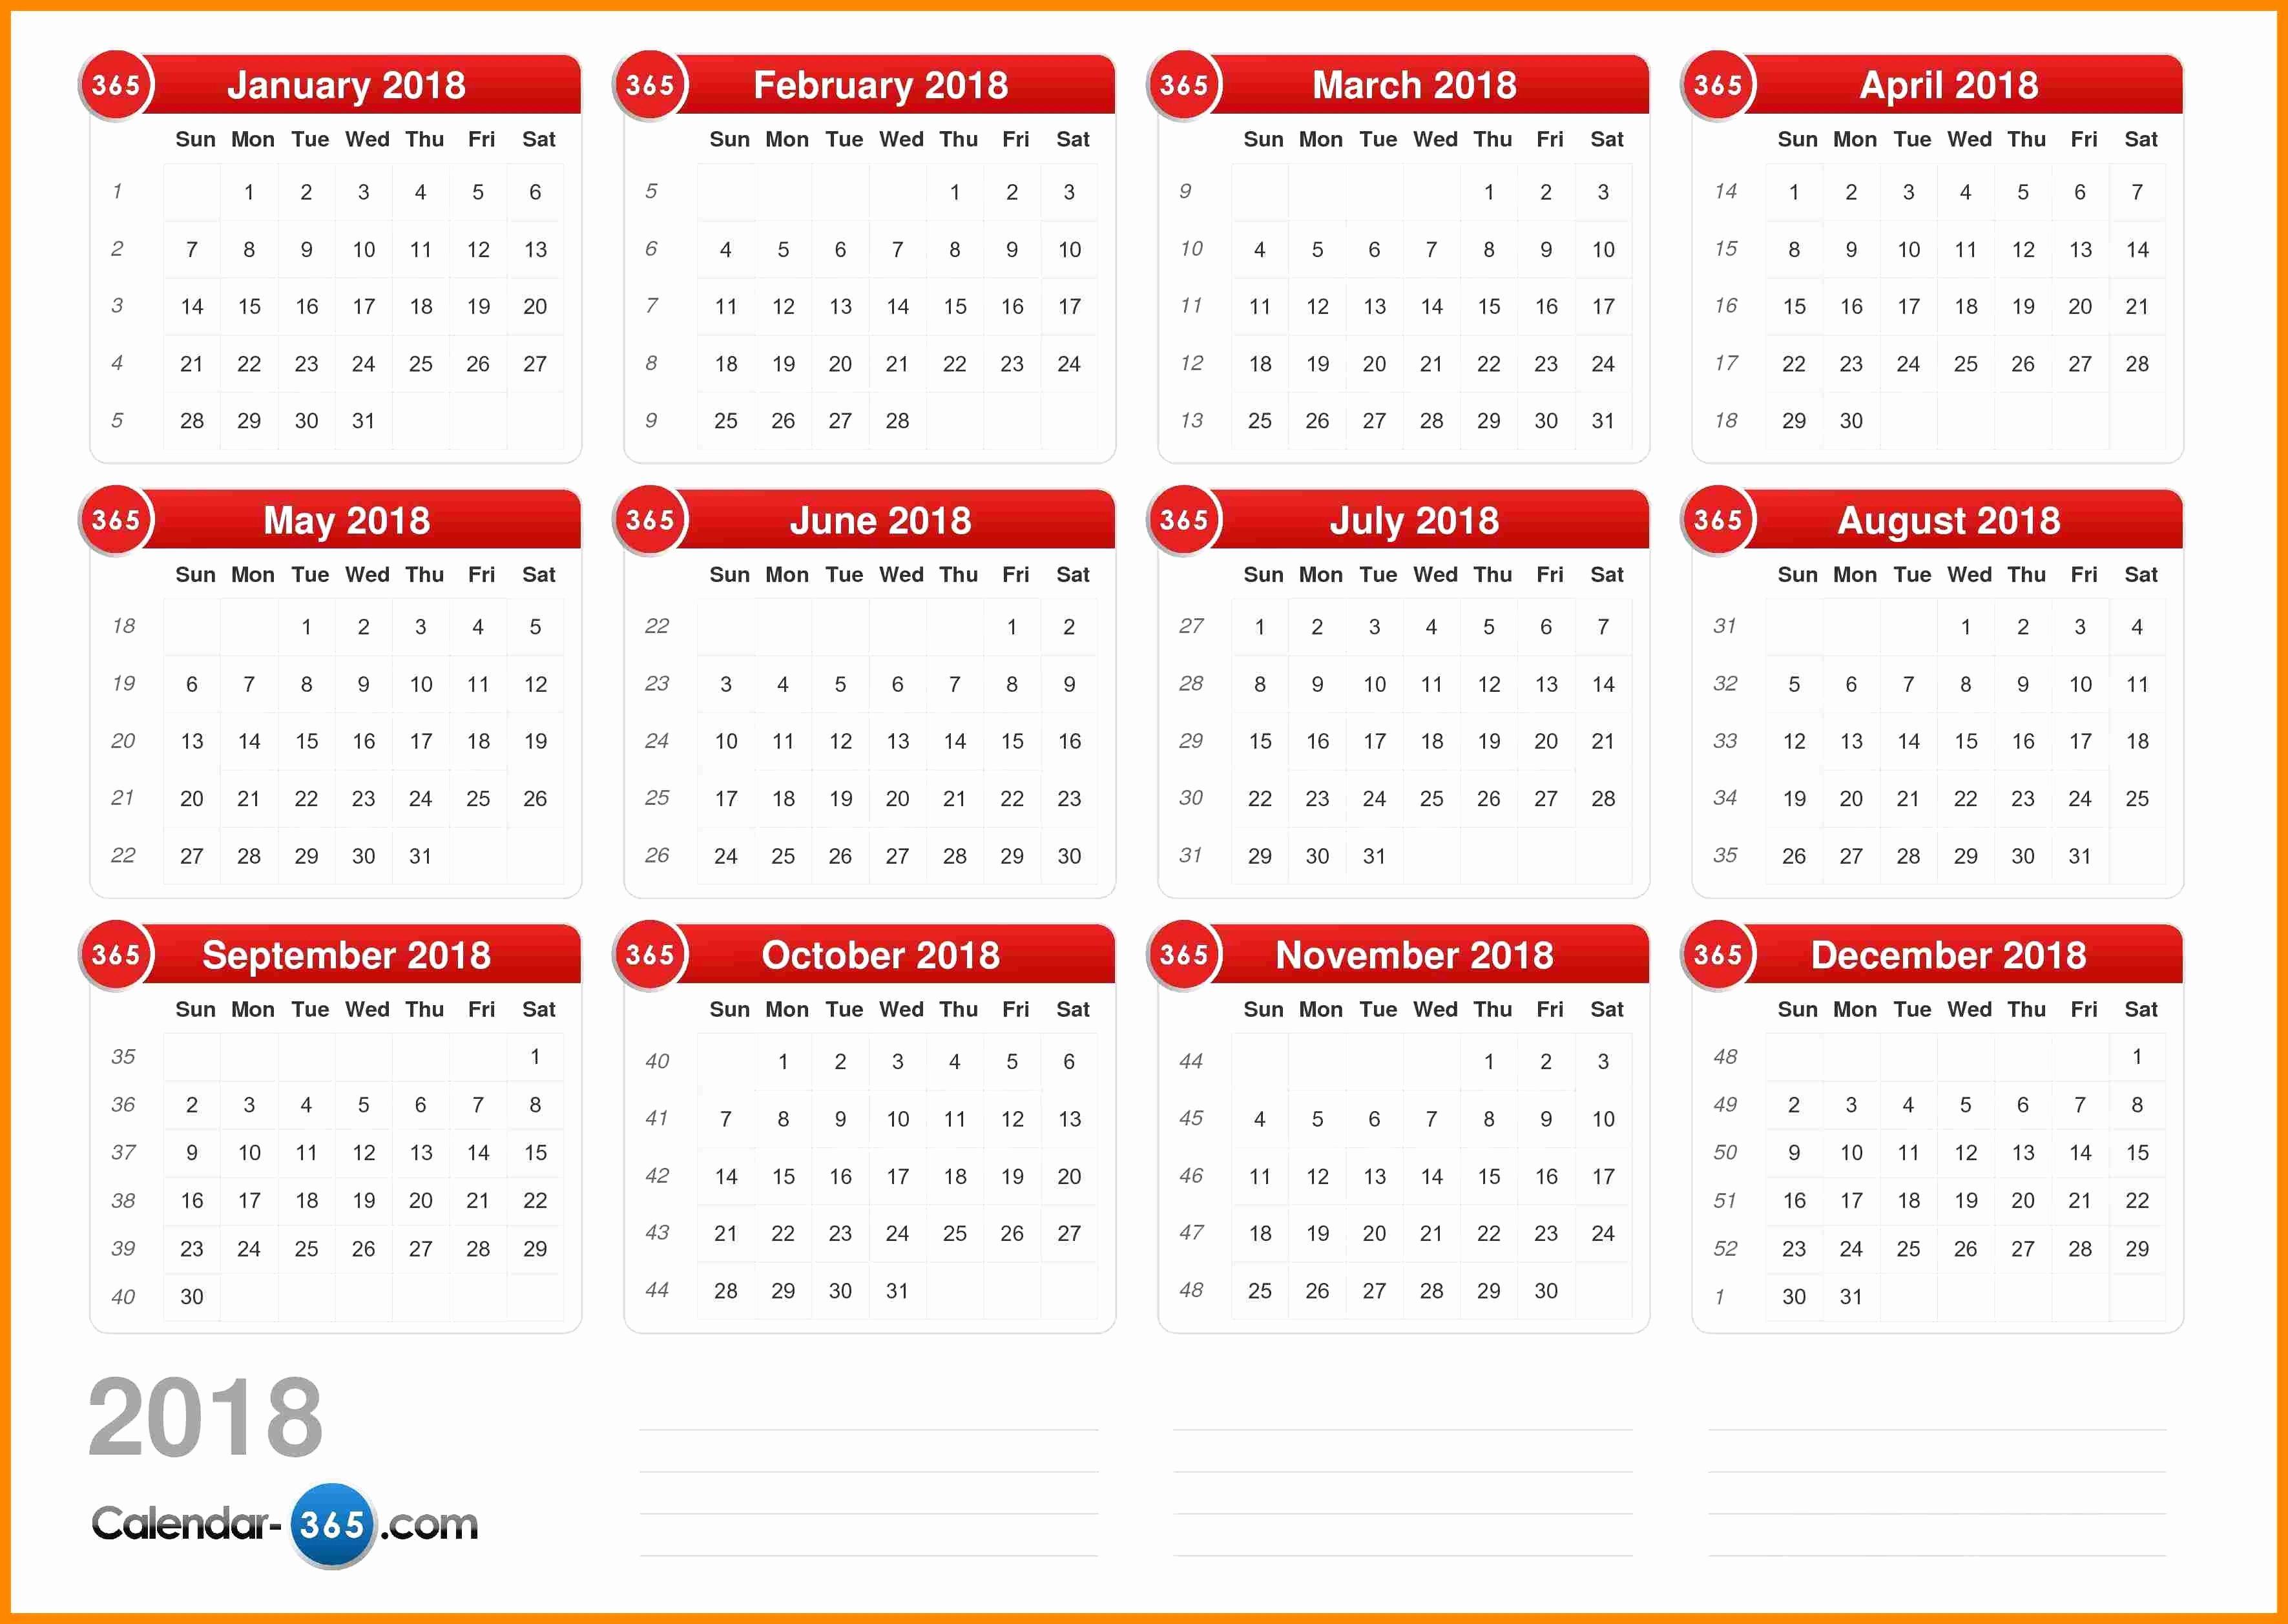 Weekly Payroll Calendar 2019 Elegant Adp 2019 Payroll Calendar Semi Monthly